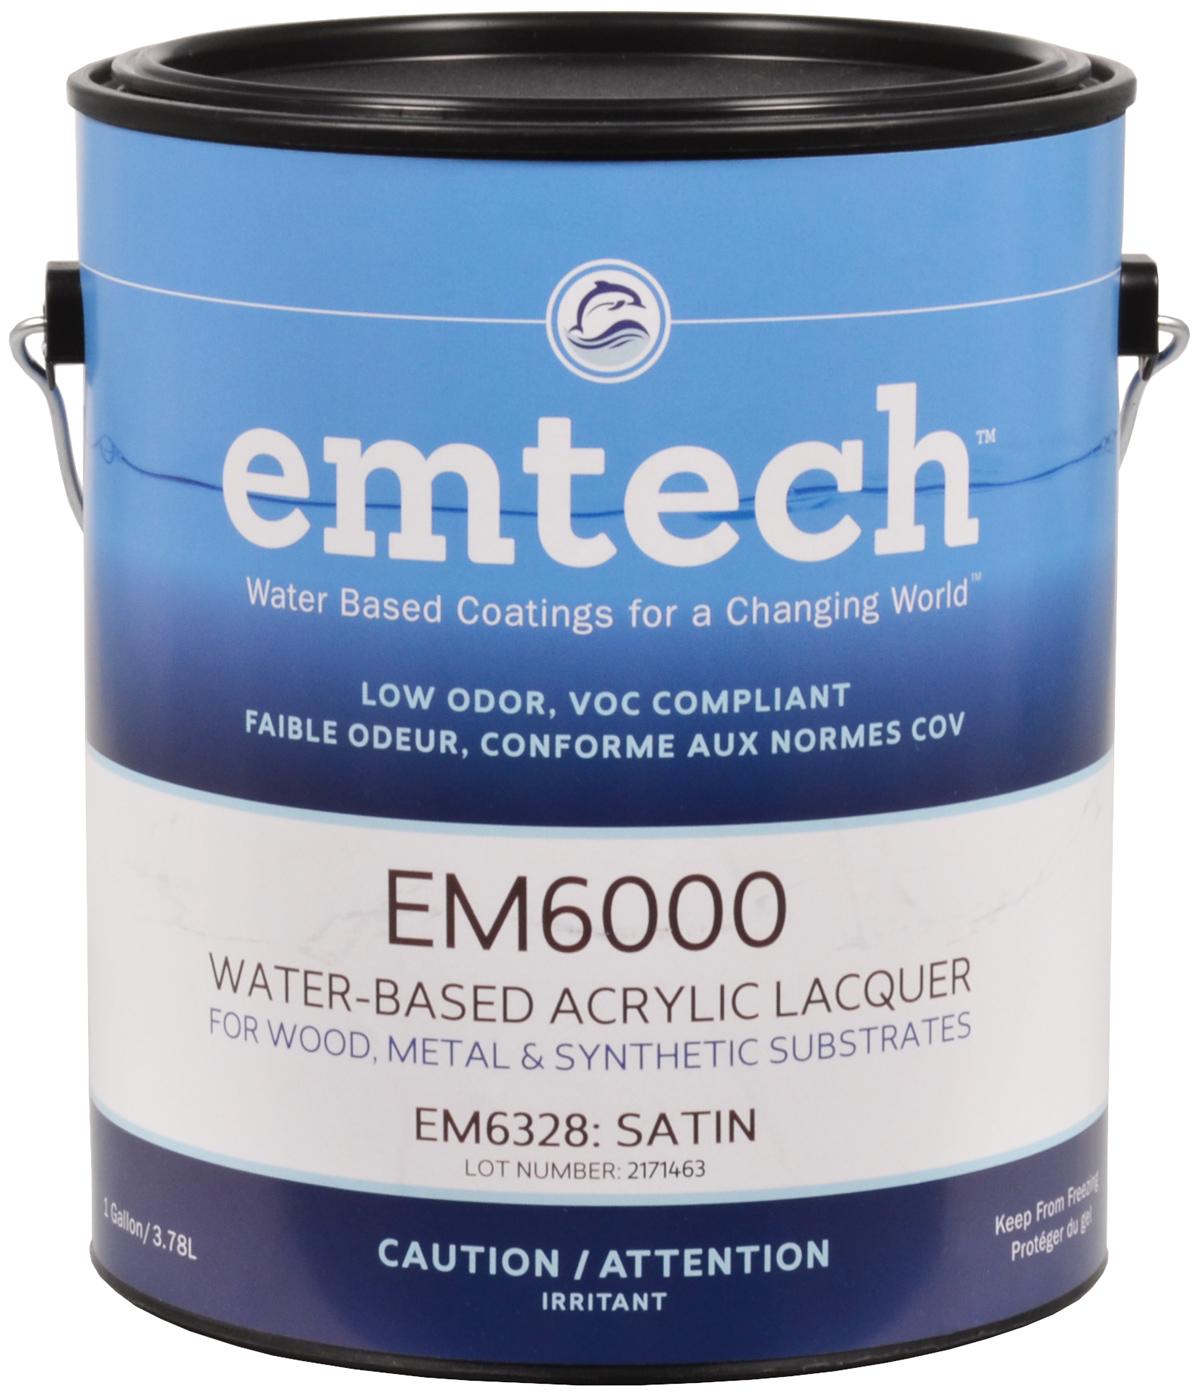 EM6000 Production Acrylic Lacquer